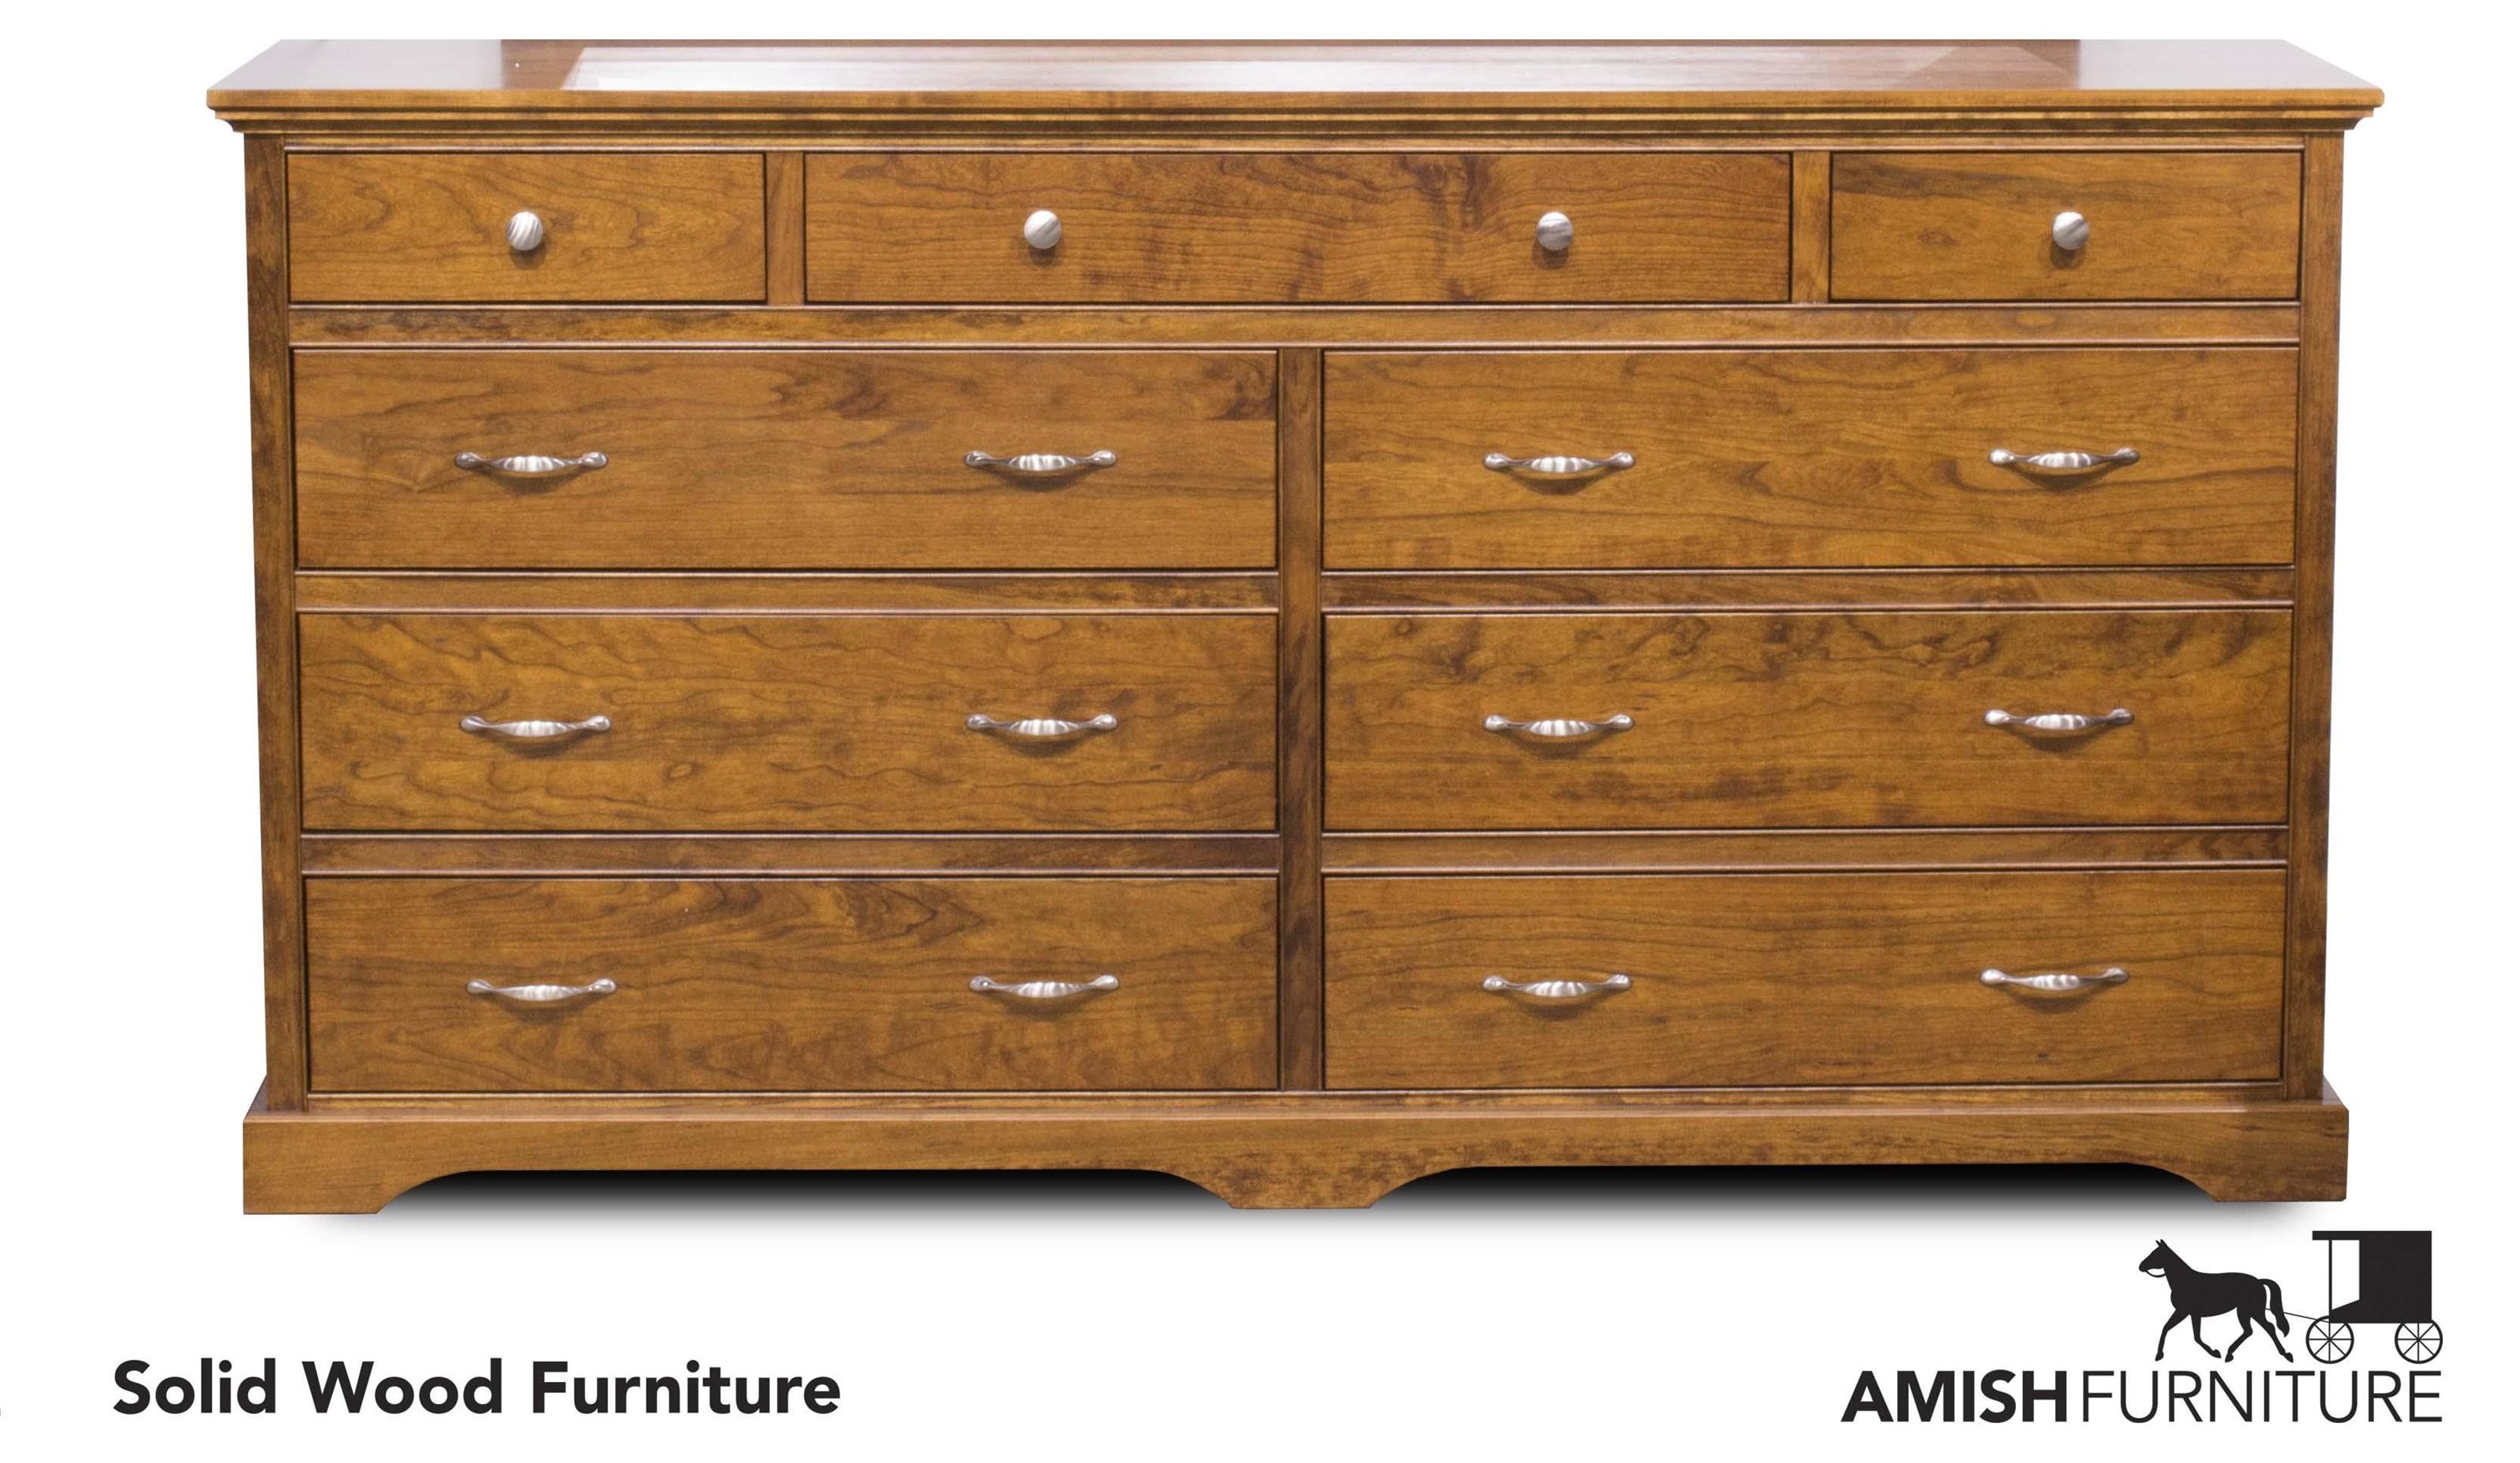 Elegance 9 Drawer Dresser by Daniel's Amish at Ruby Gordon Home